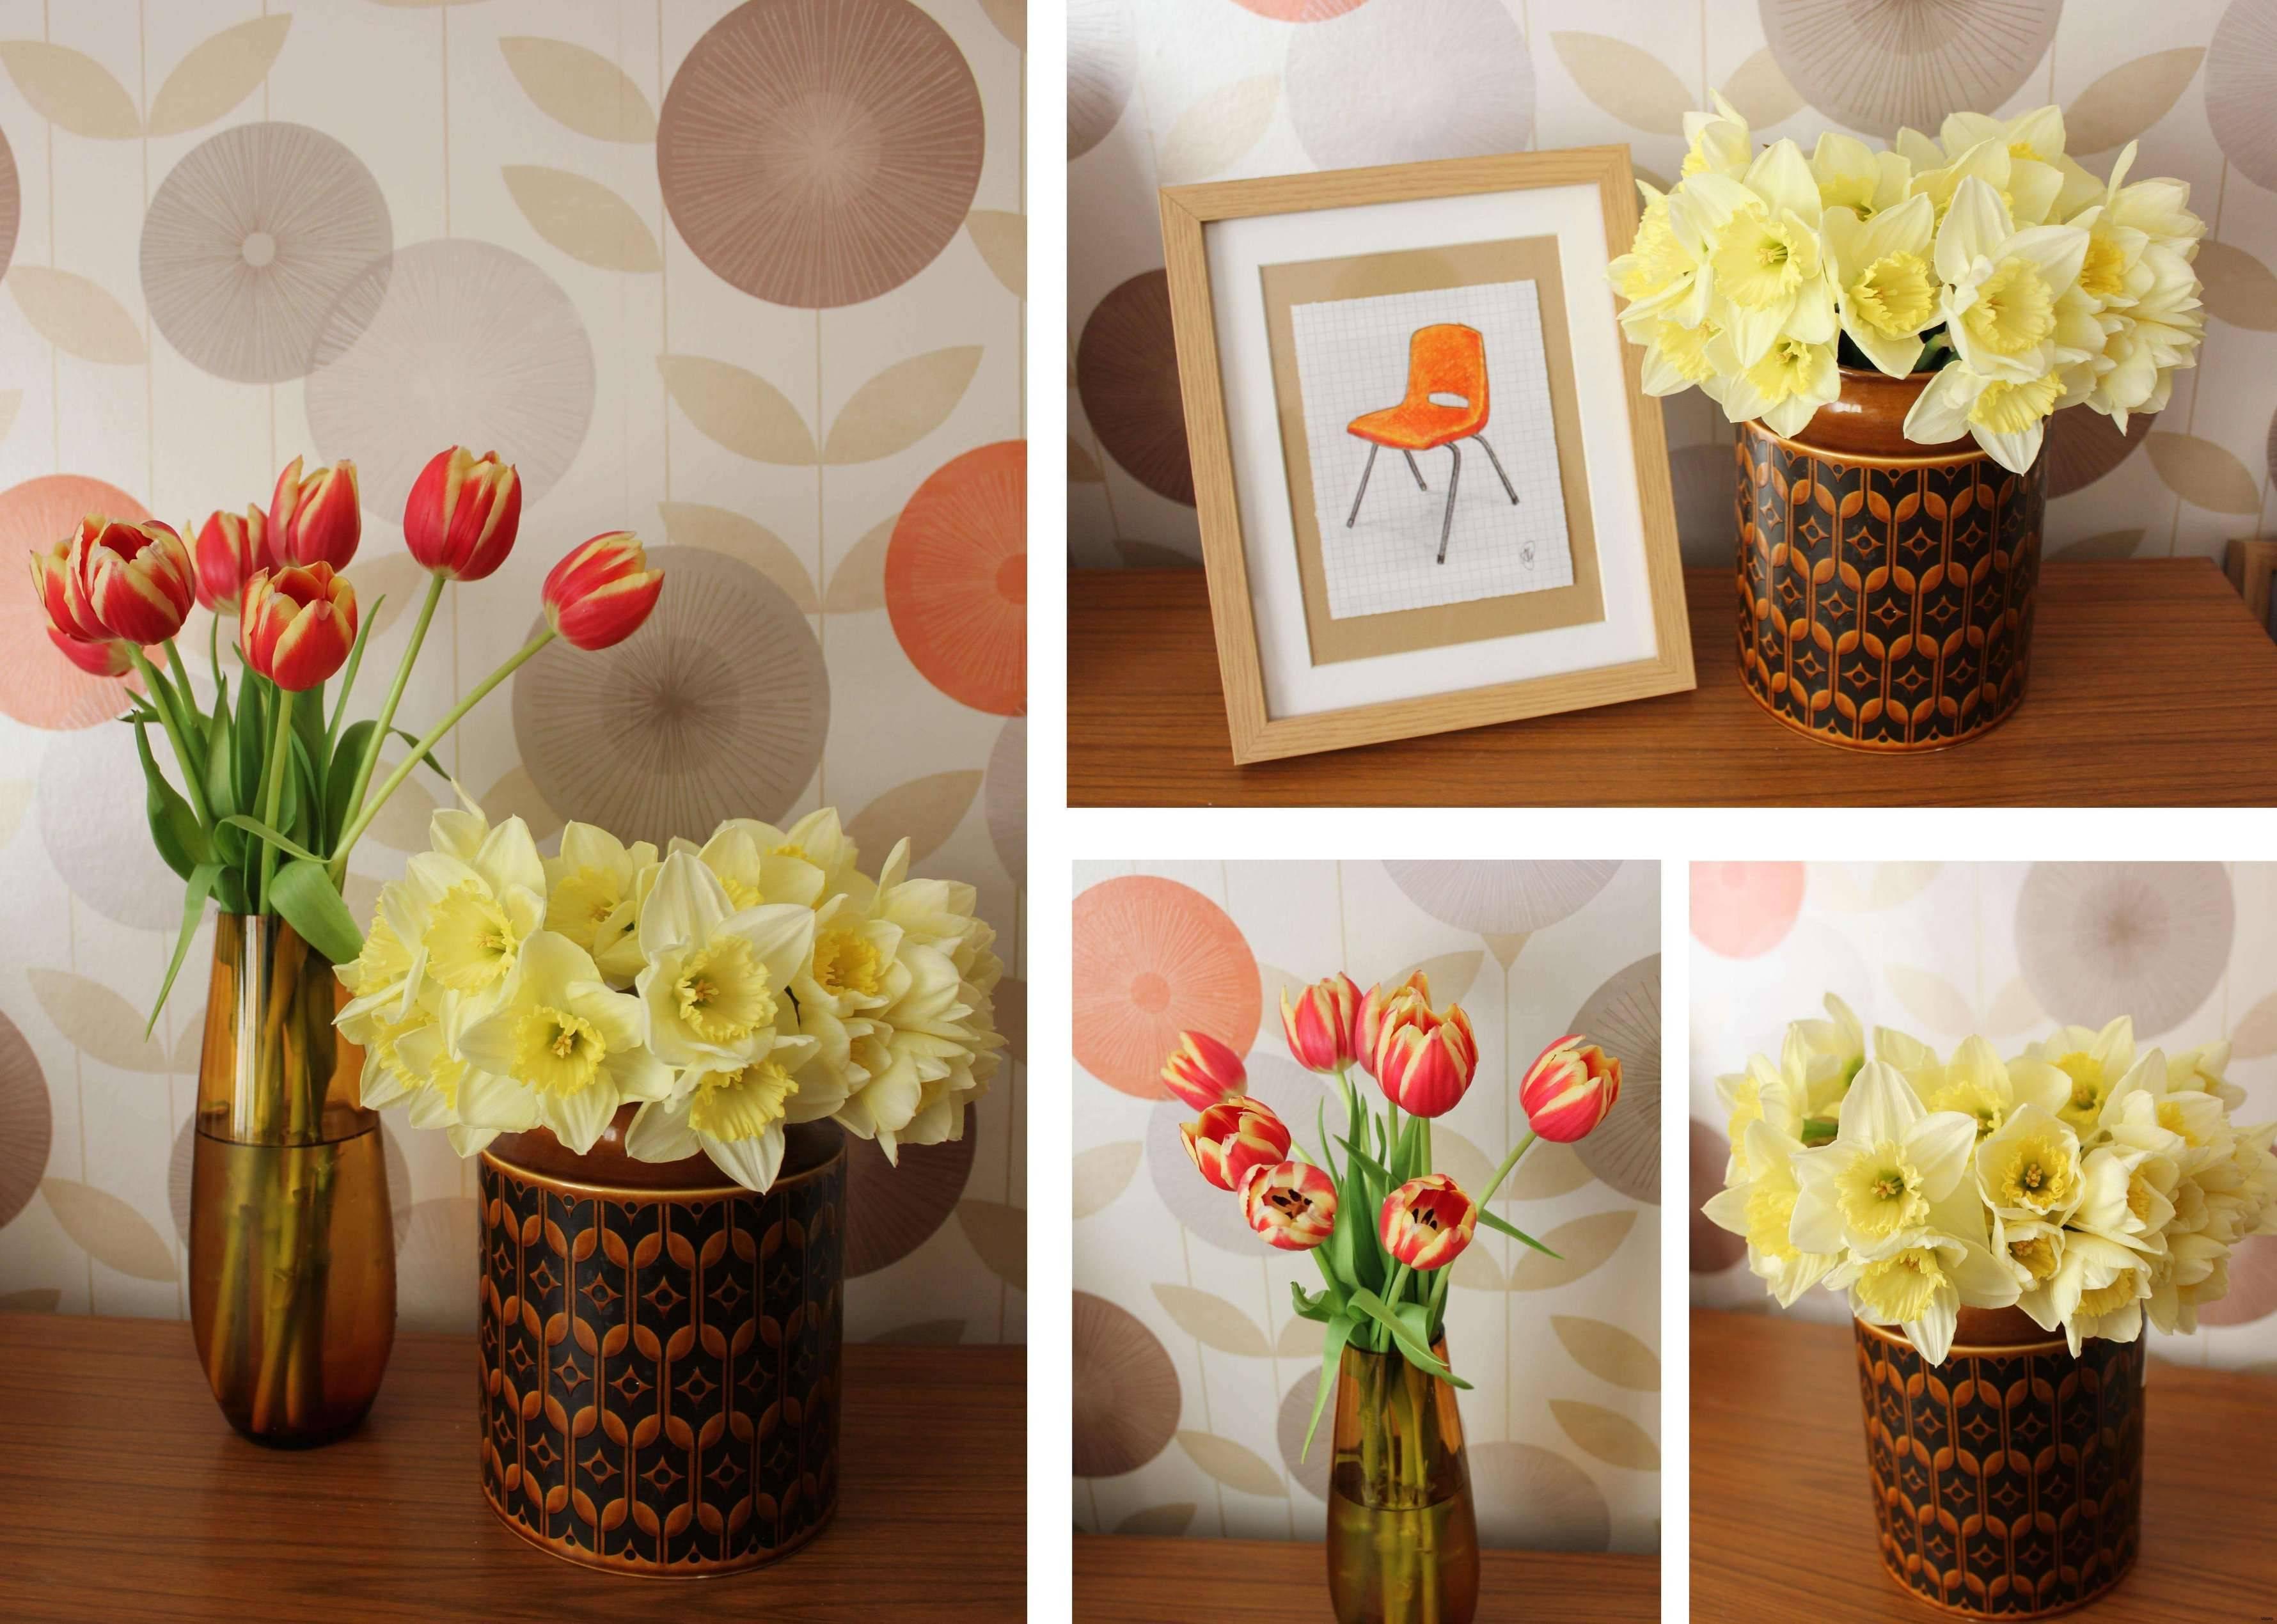 diy home decor vaseh vases decorative flower ideas i 0d design ideas inside vases wall art of vases wall art